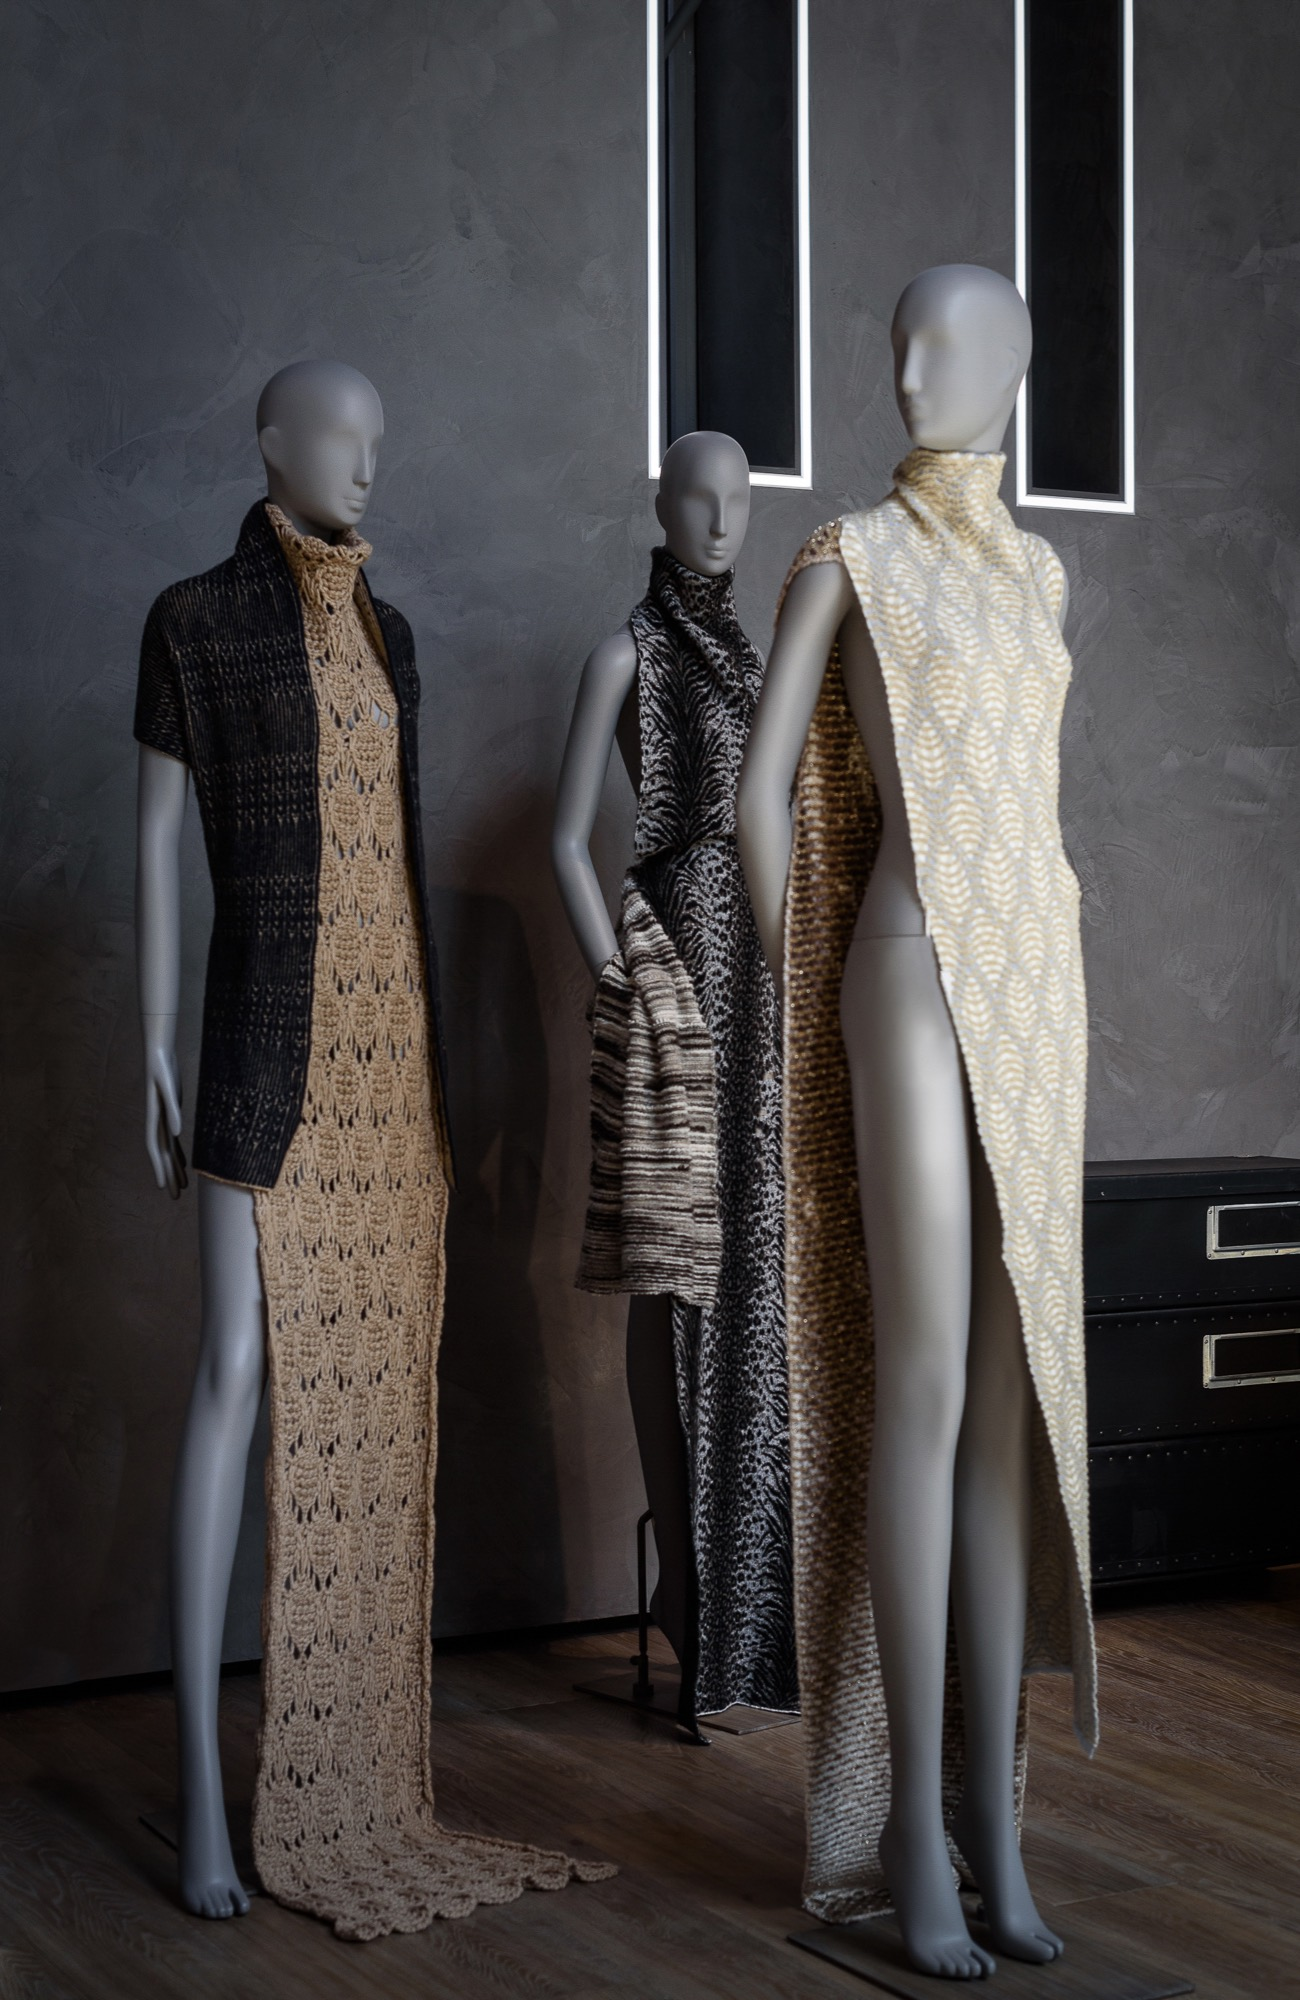 Schläppi 2000 female mannequin In Linea Piu yarns for exhibition at BonaveriMilano